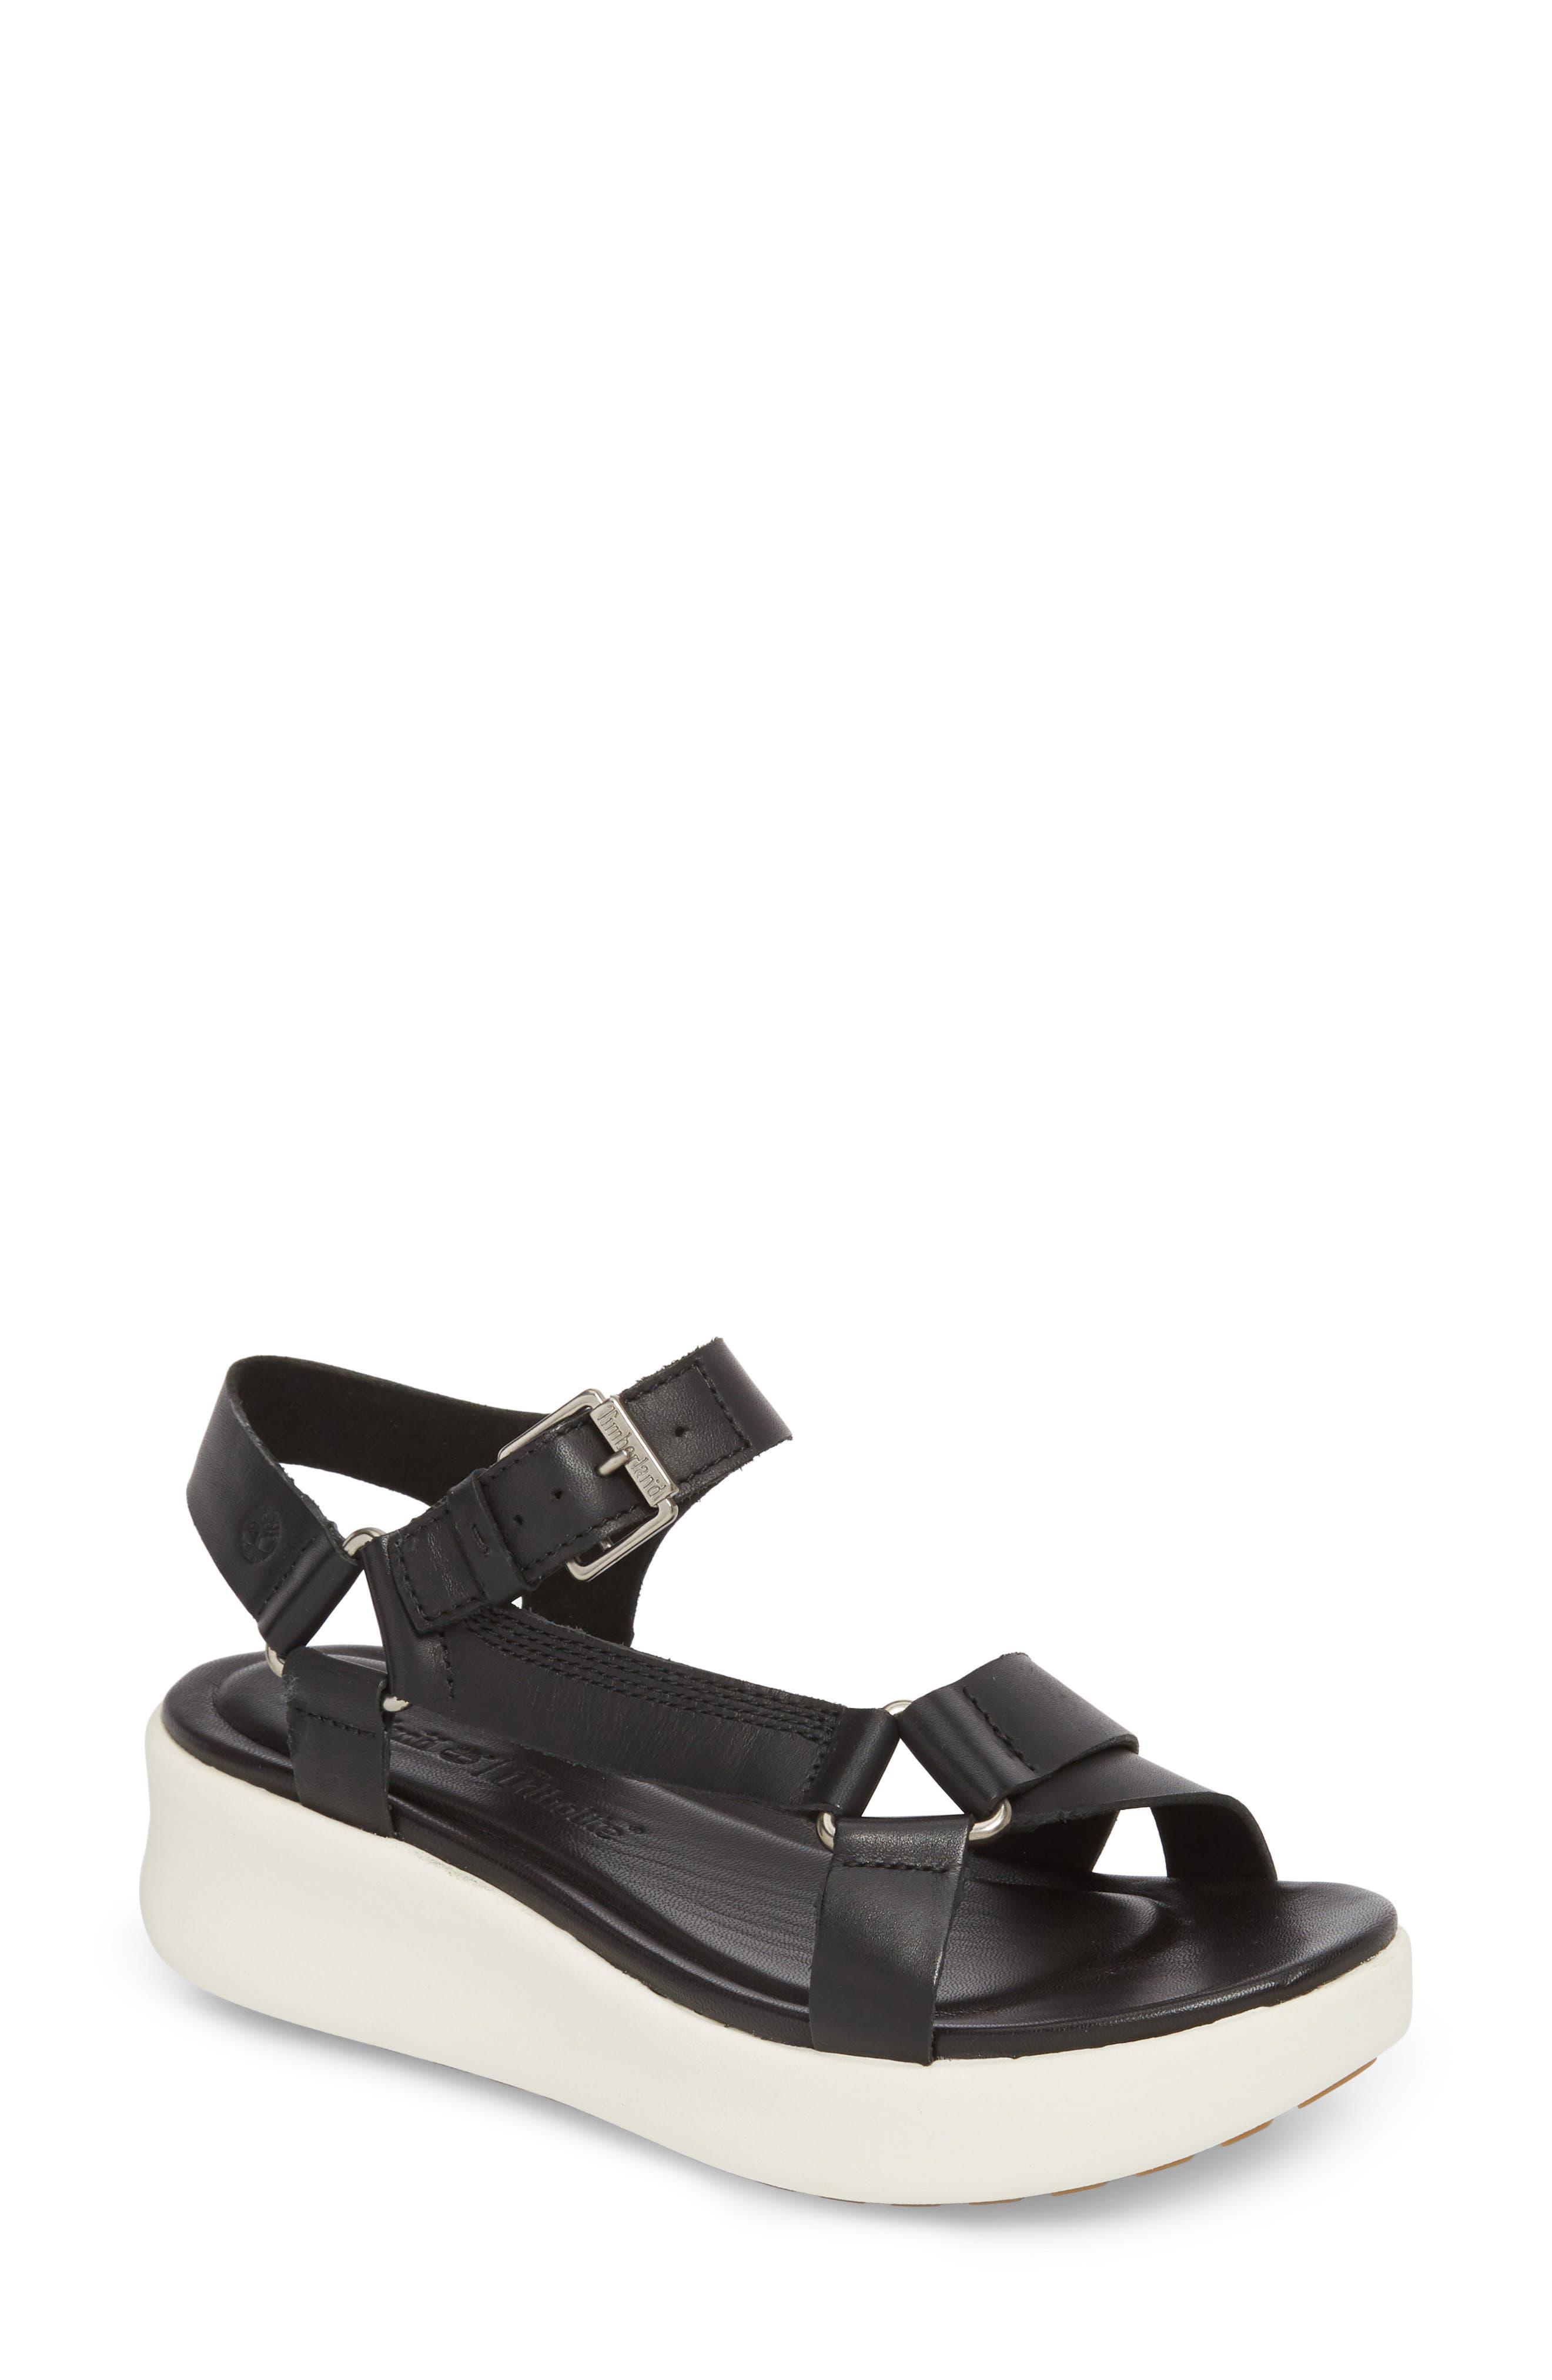 Los Angeles Wind Sport Sandal,                         Main,                         color, Black Leather